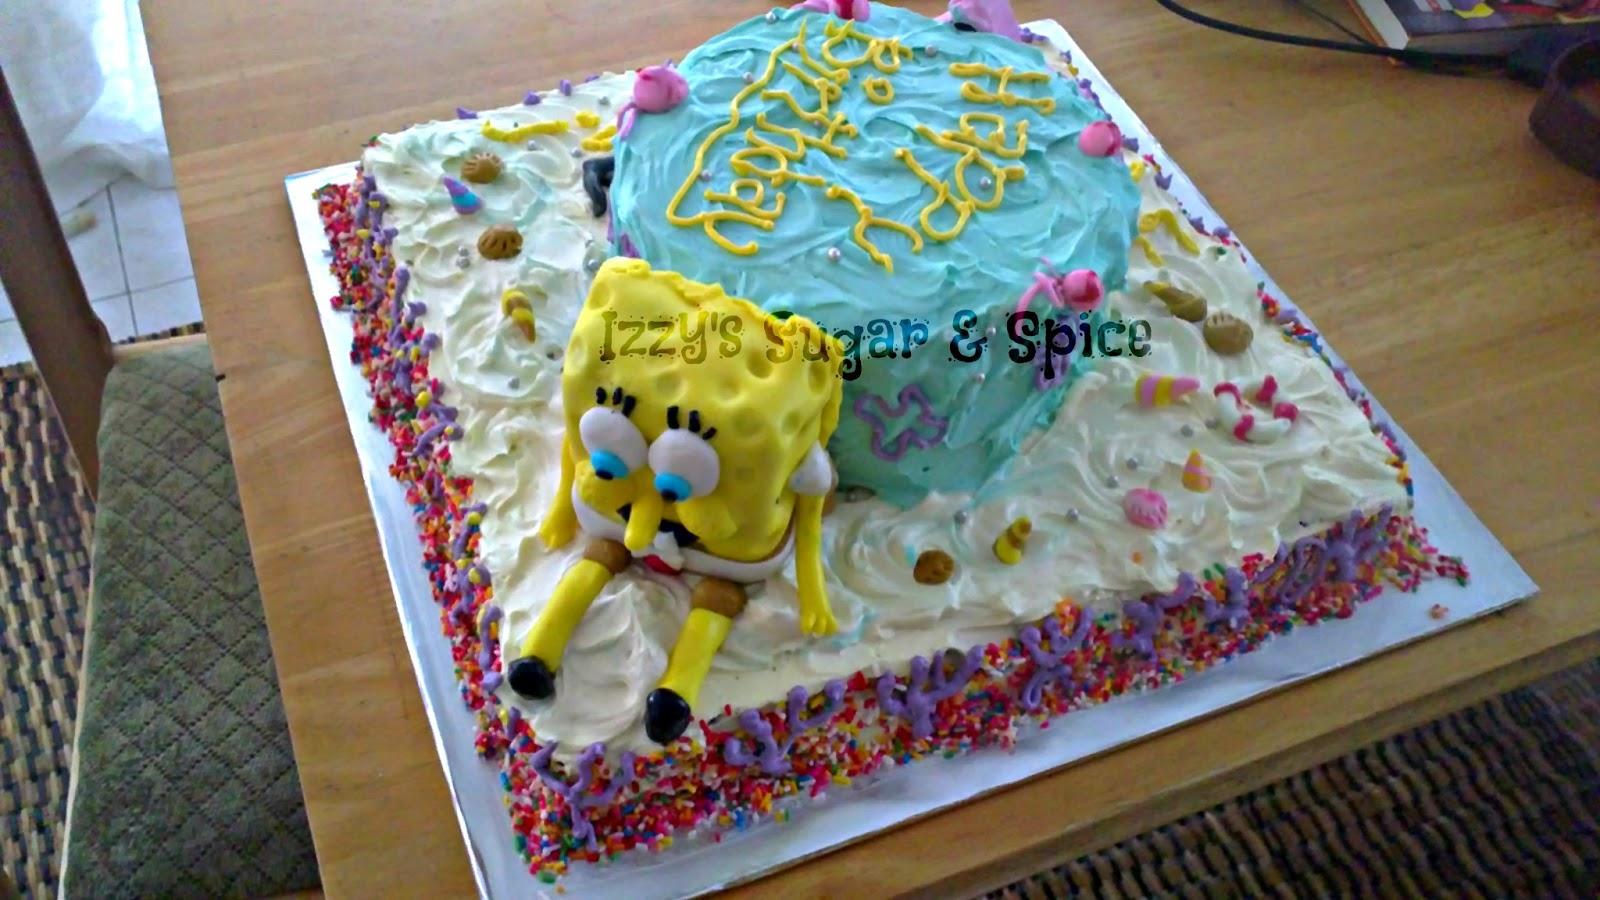 Izzys Sugar Spice Sponge Bob Cake